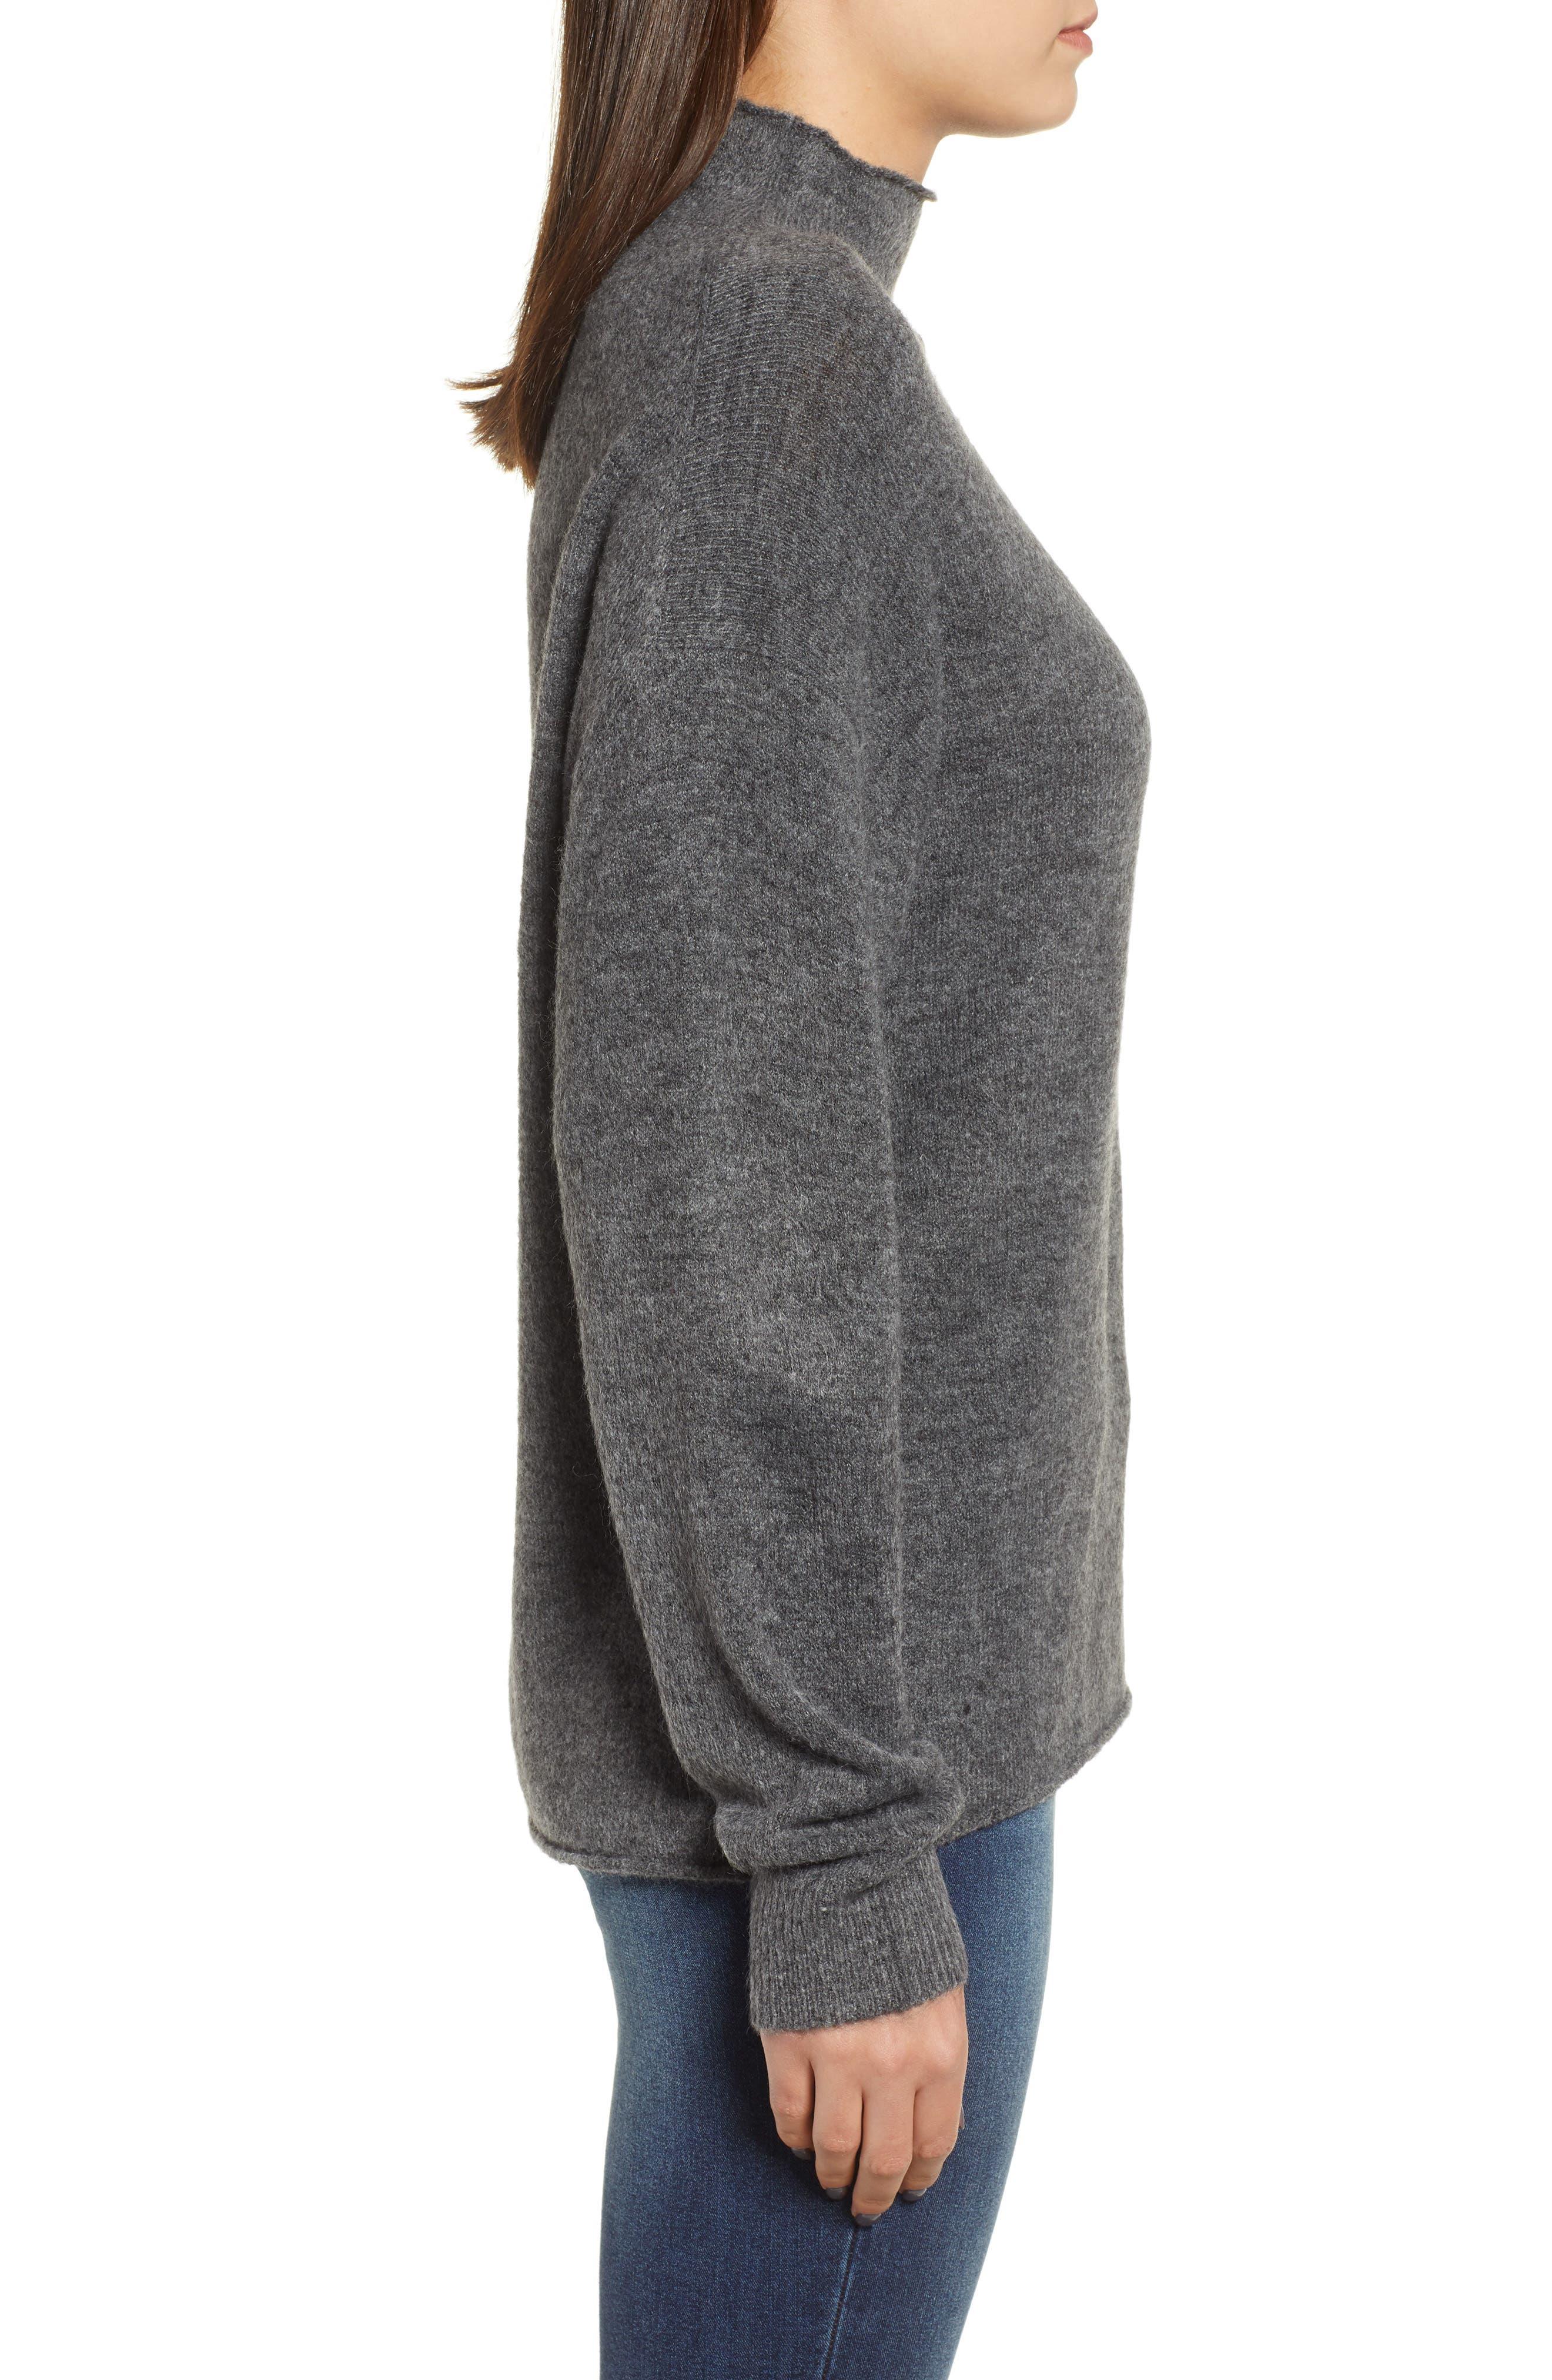 Cozy Mock Neck Sweater,                             Alternate thumbnail 4, color,                             GREY MEDIUM CHARCOAL HEATHER